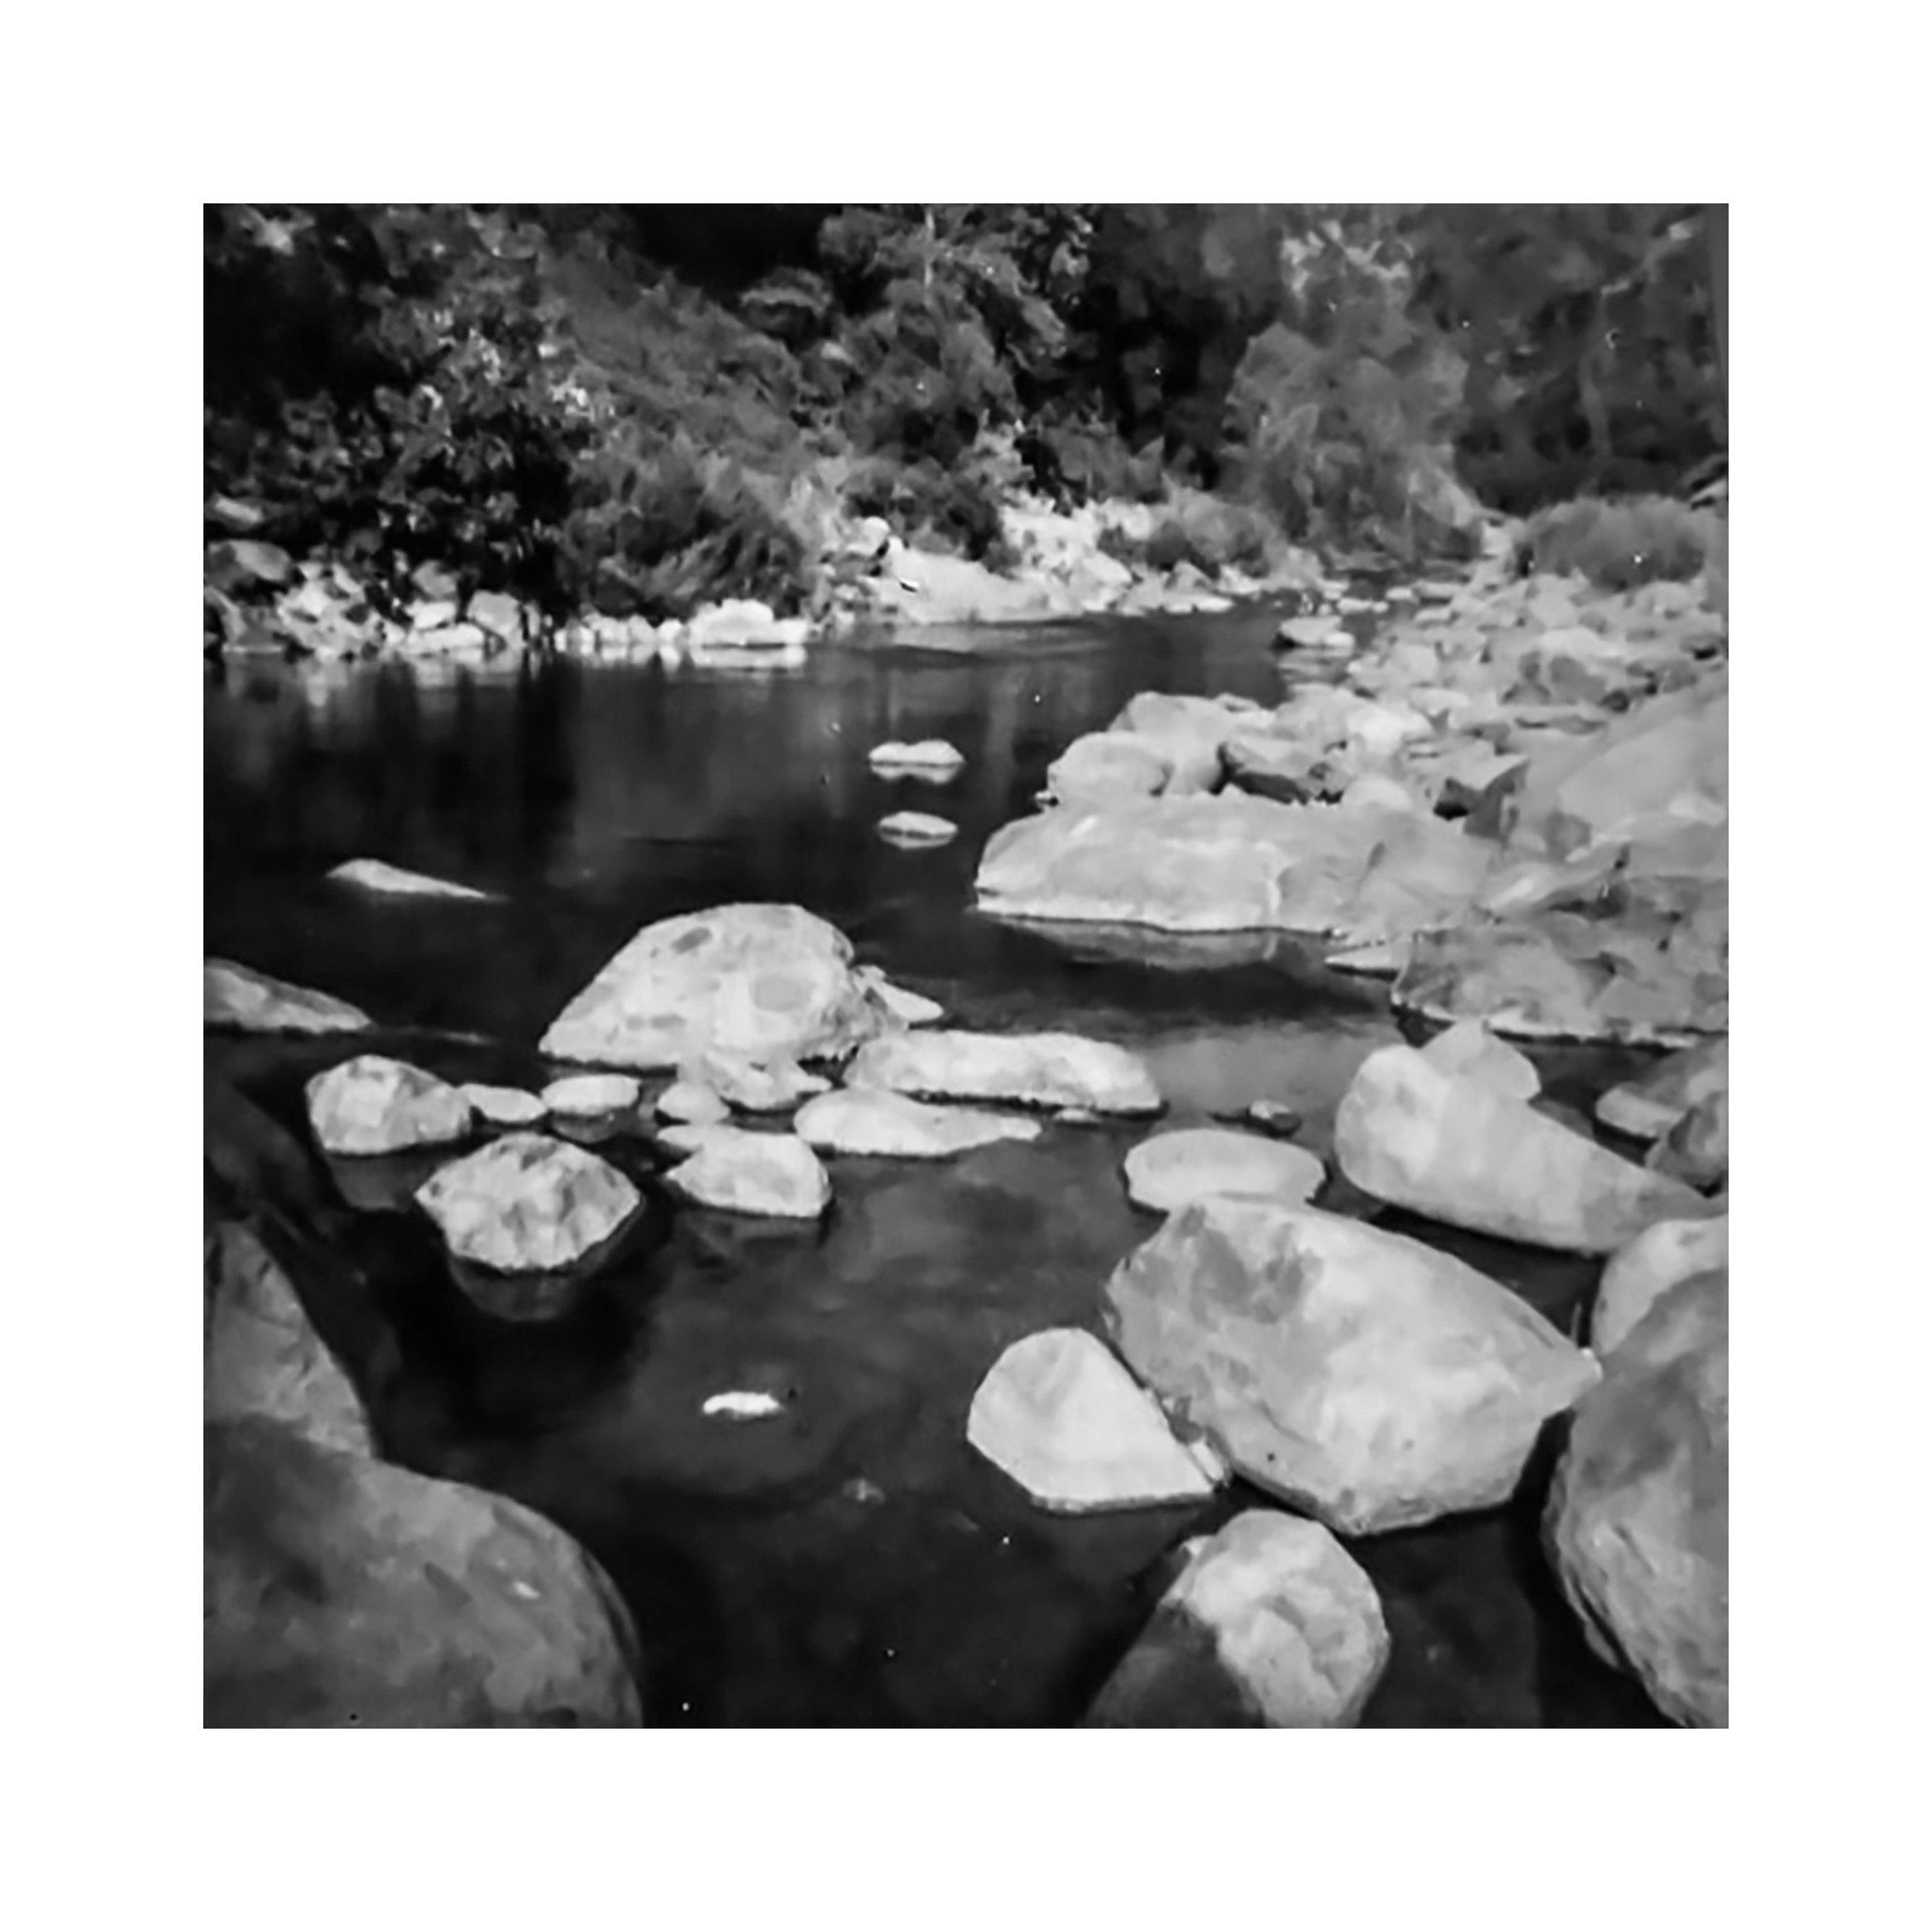 15x15 image size 19x19 print size POLAROID-3.jpg